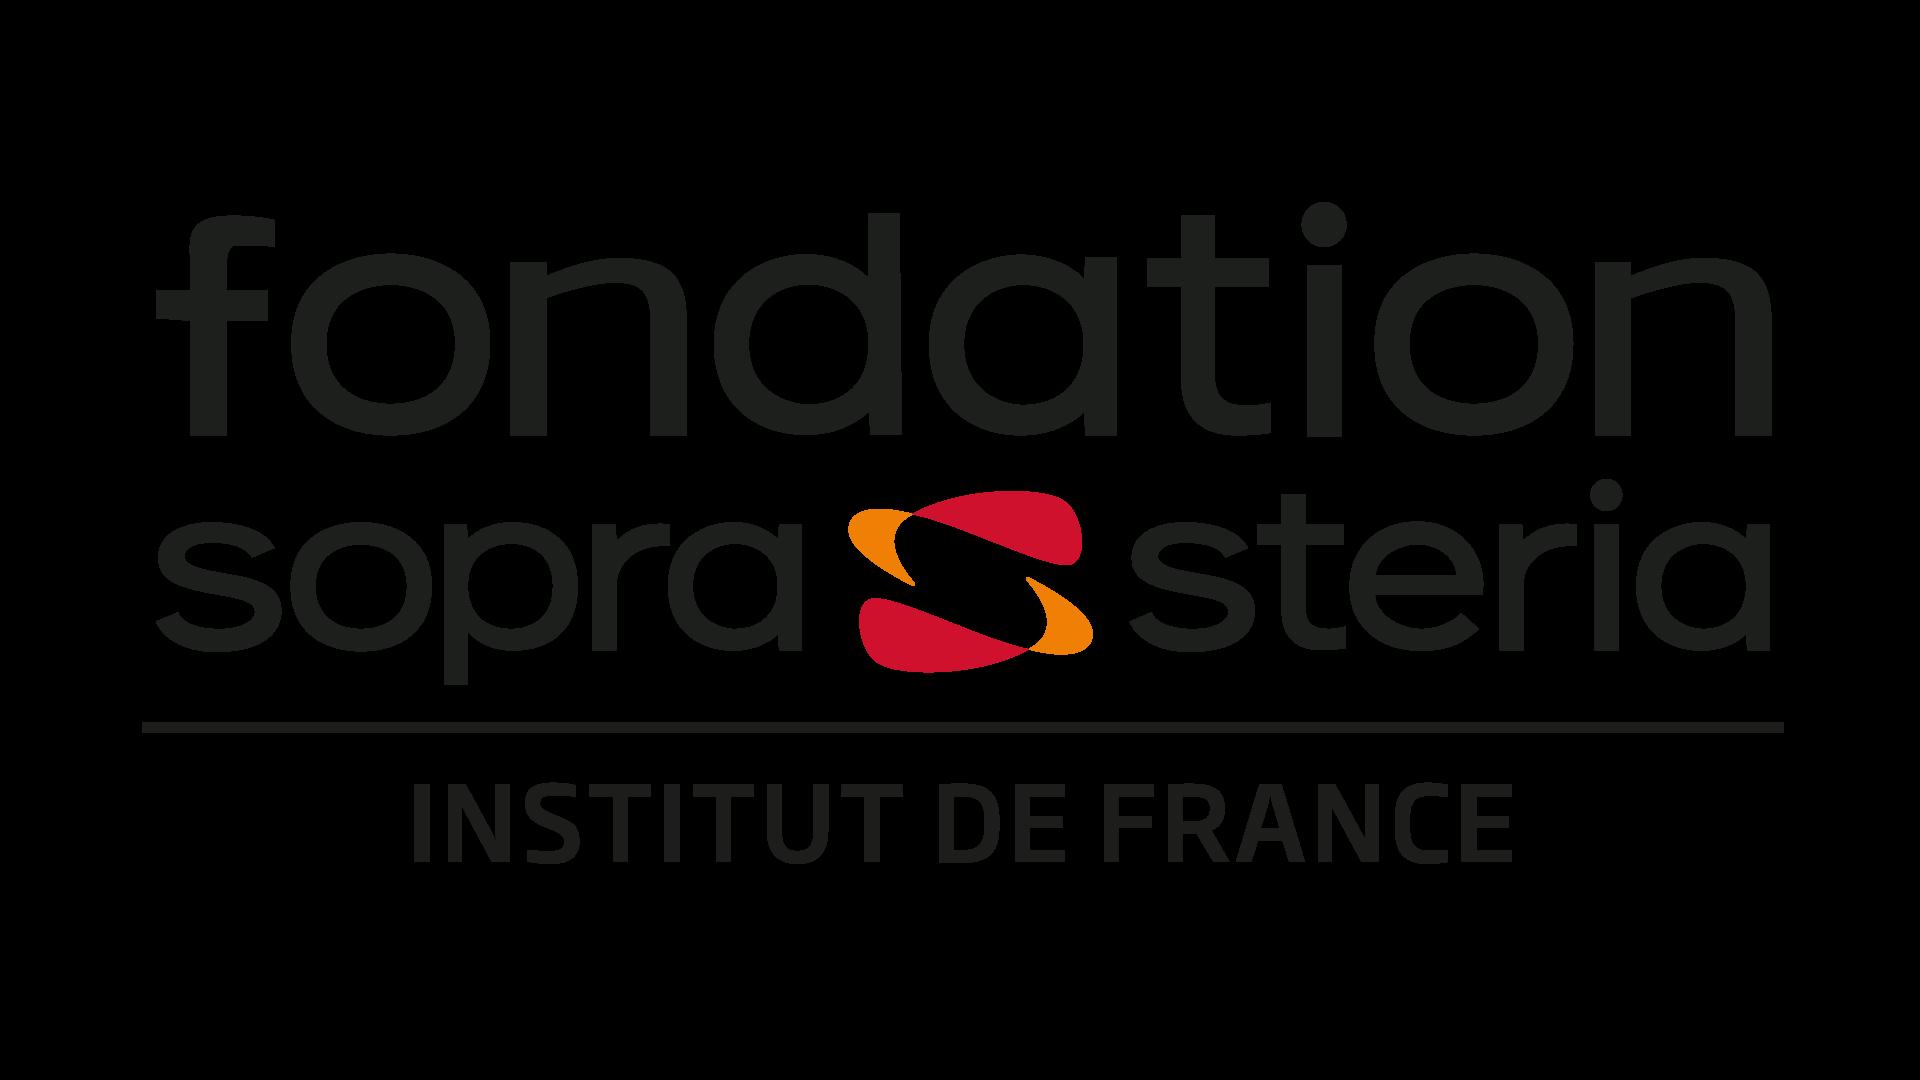 logo Fondation Sopra Steria-Institut de France